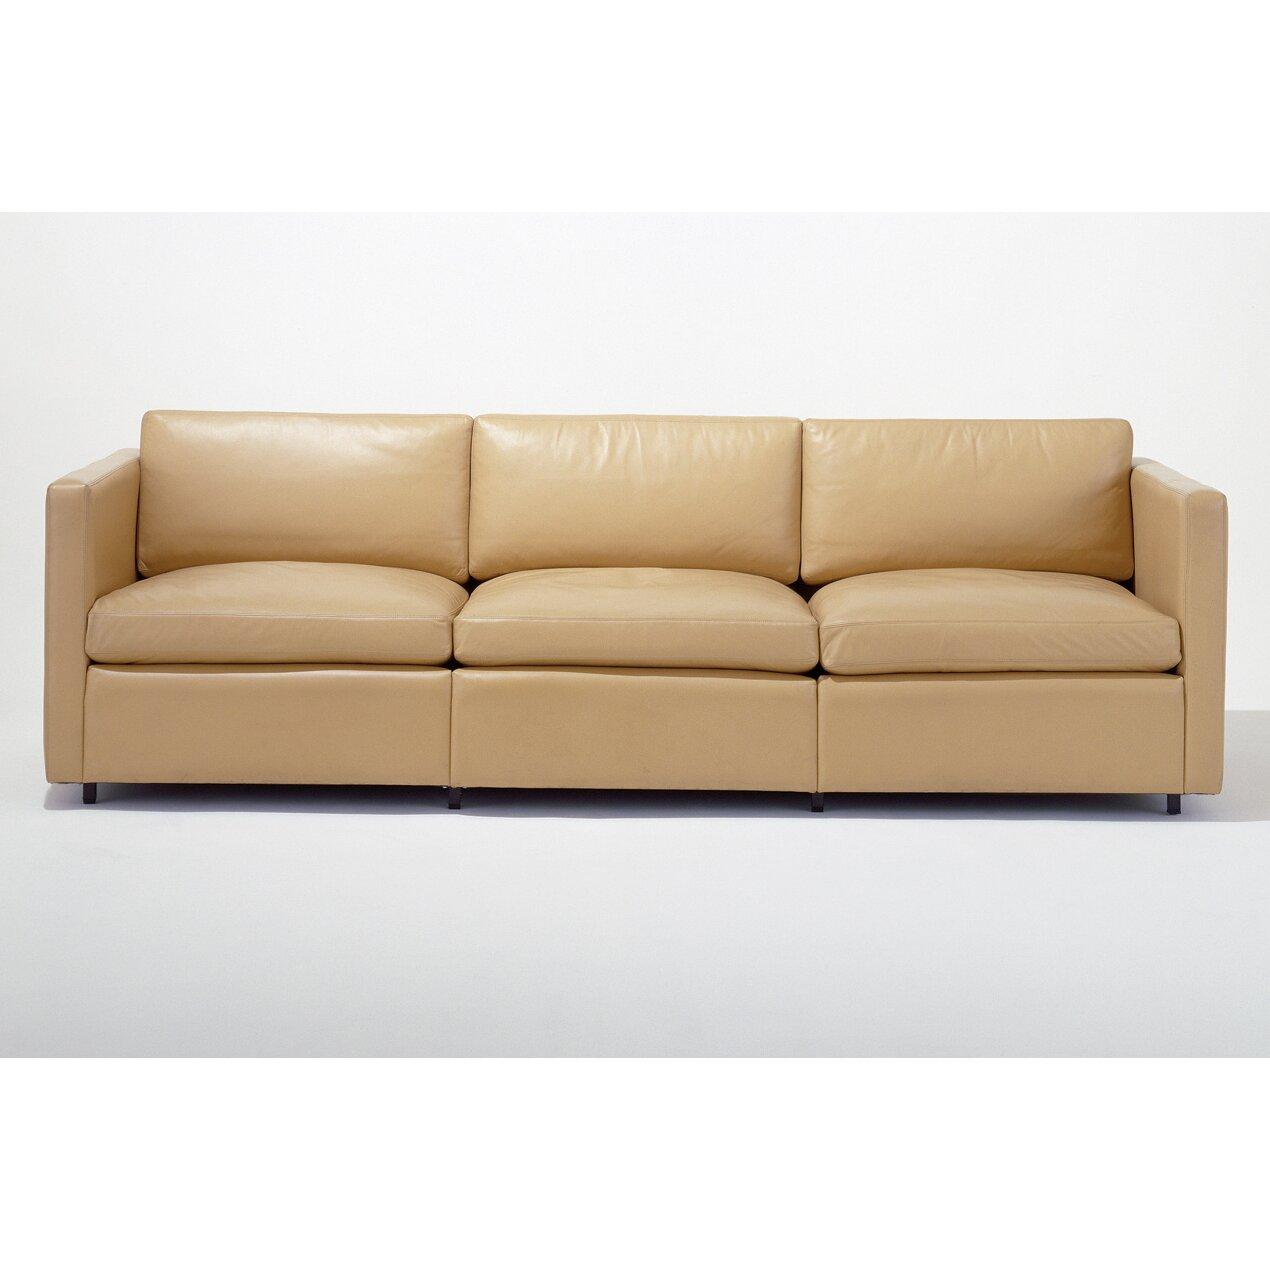 Charles Pfister Sofa Wayfair Supply